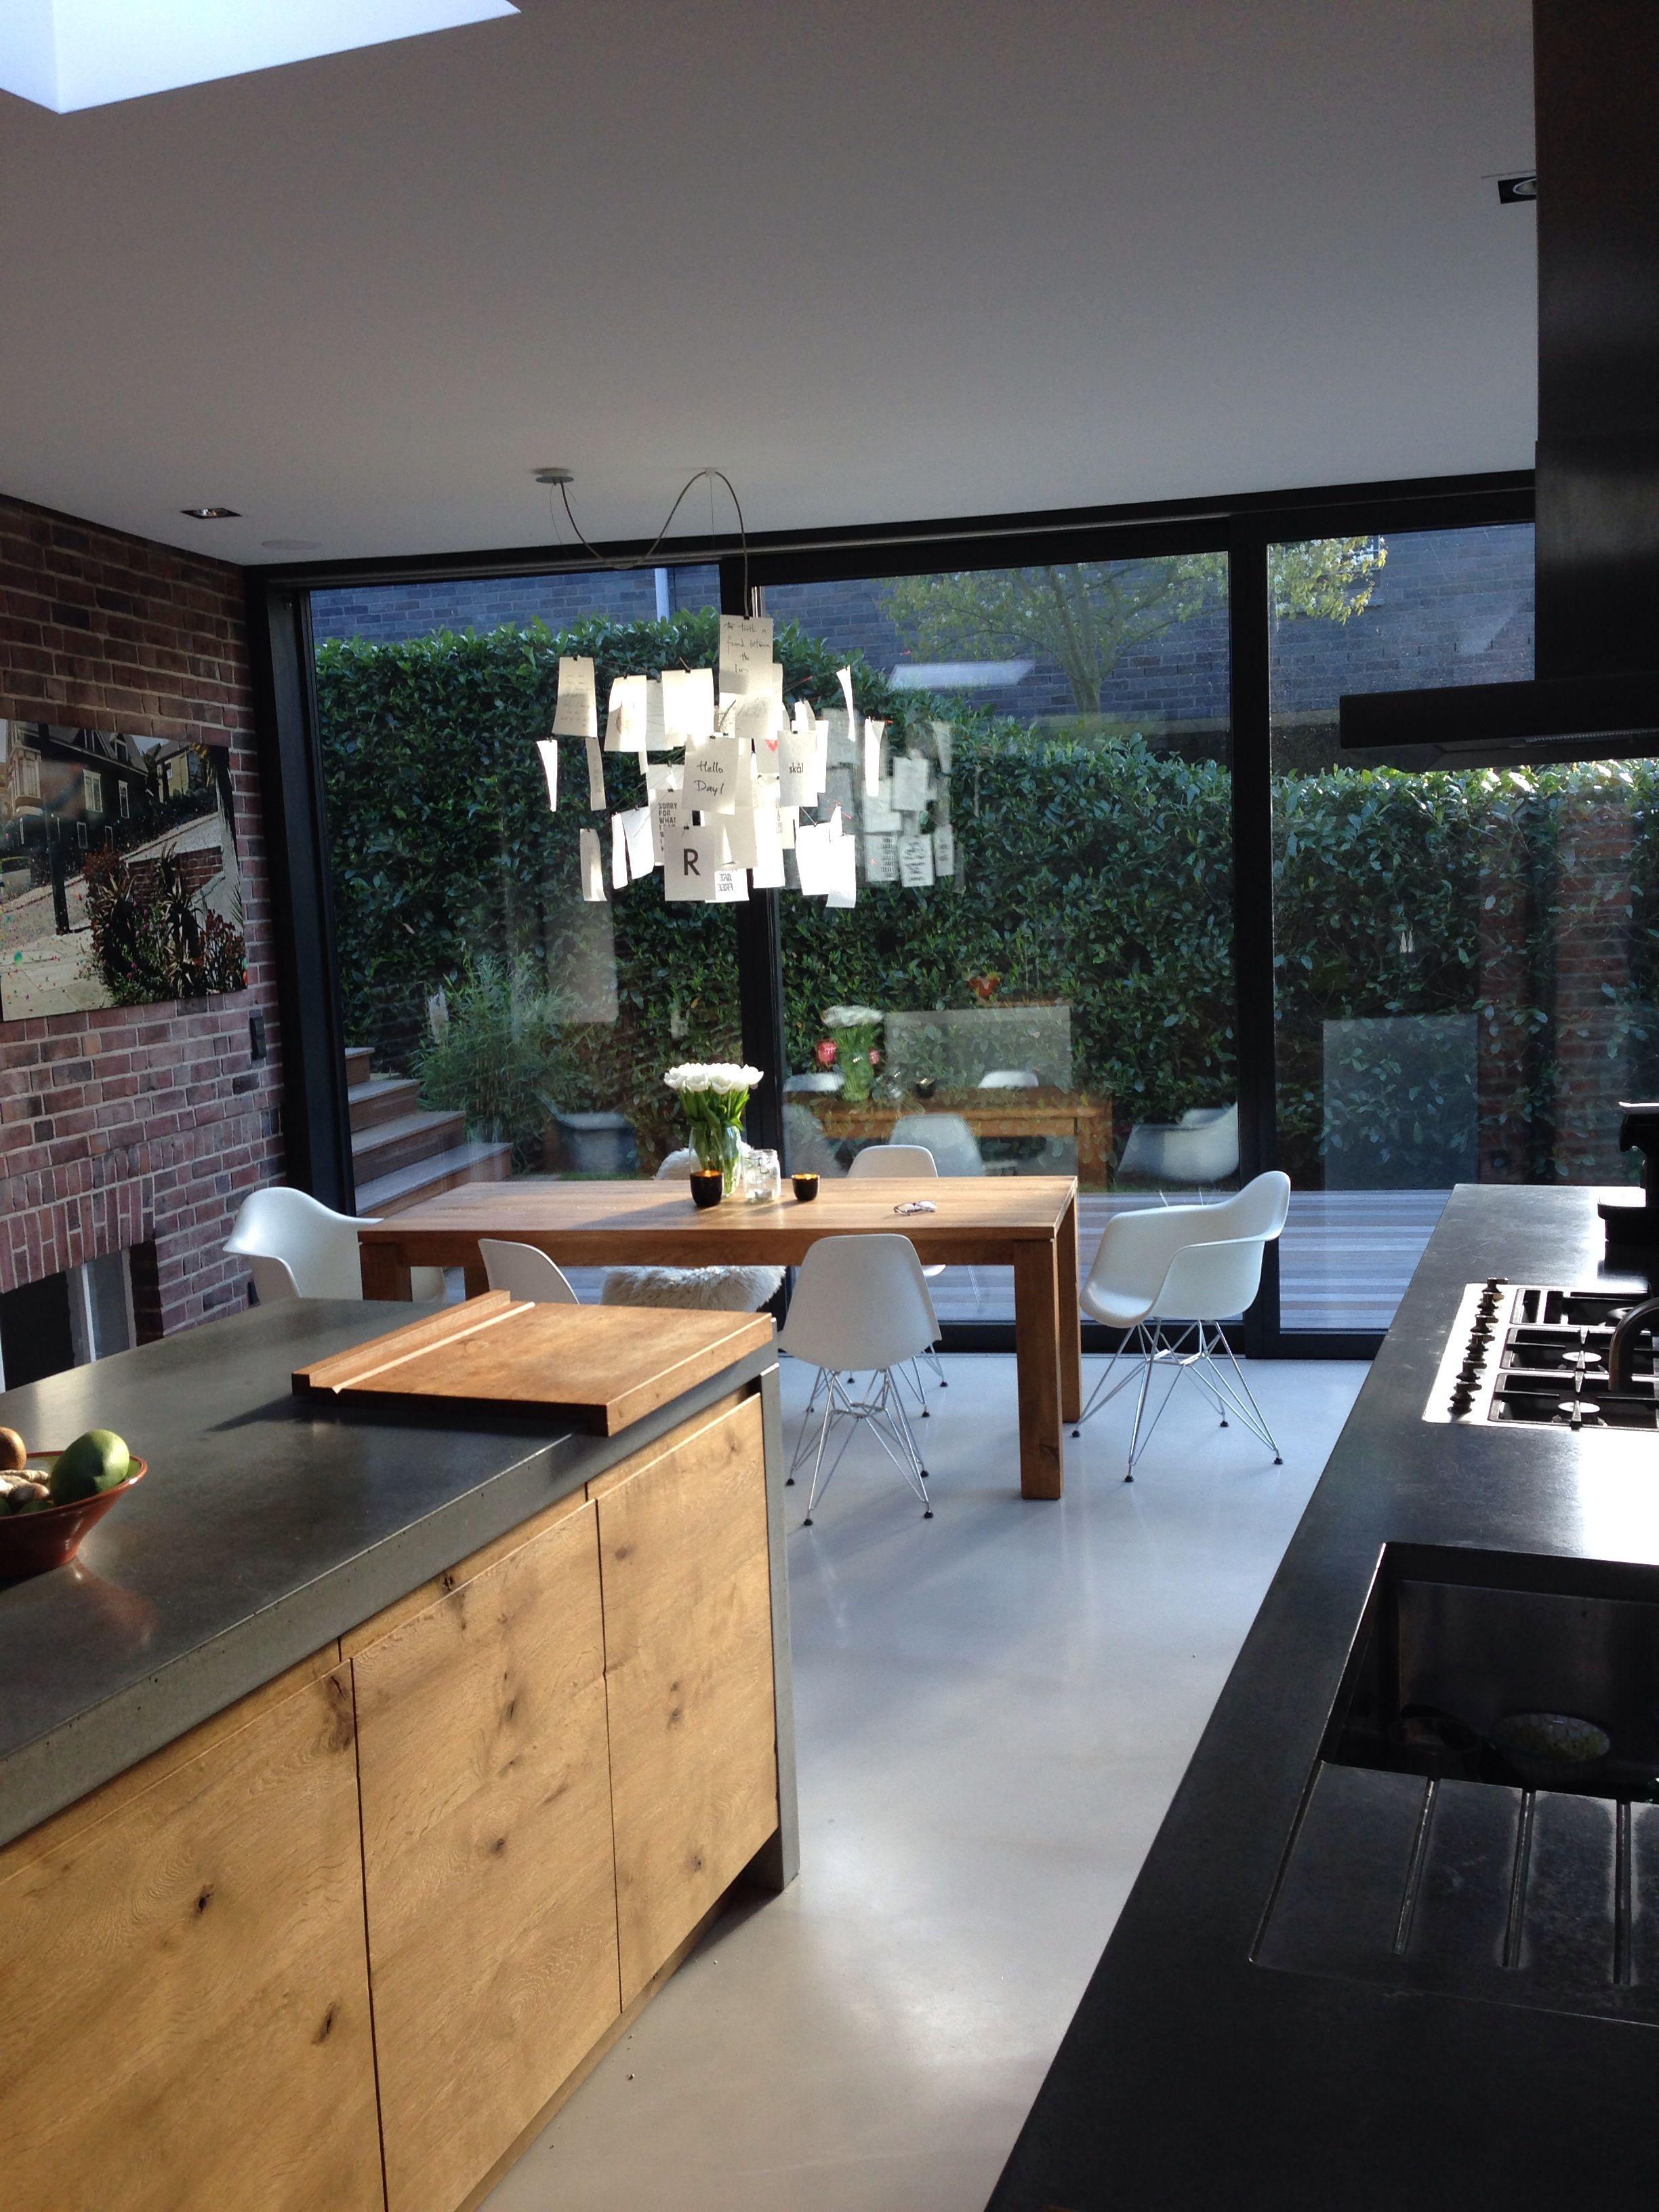 küche mit betonarbeitsplatte | haus ideen | pinterest | cuisines